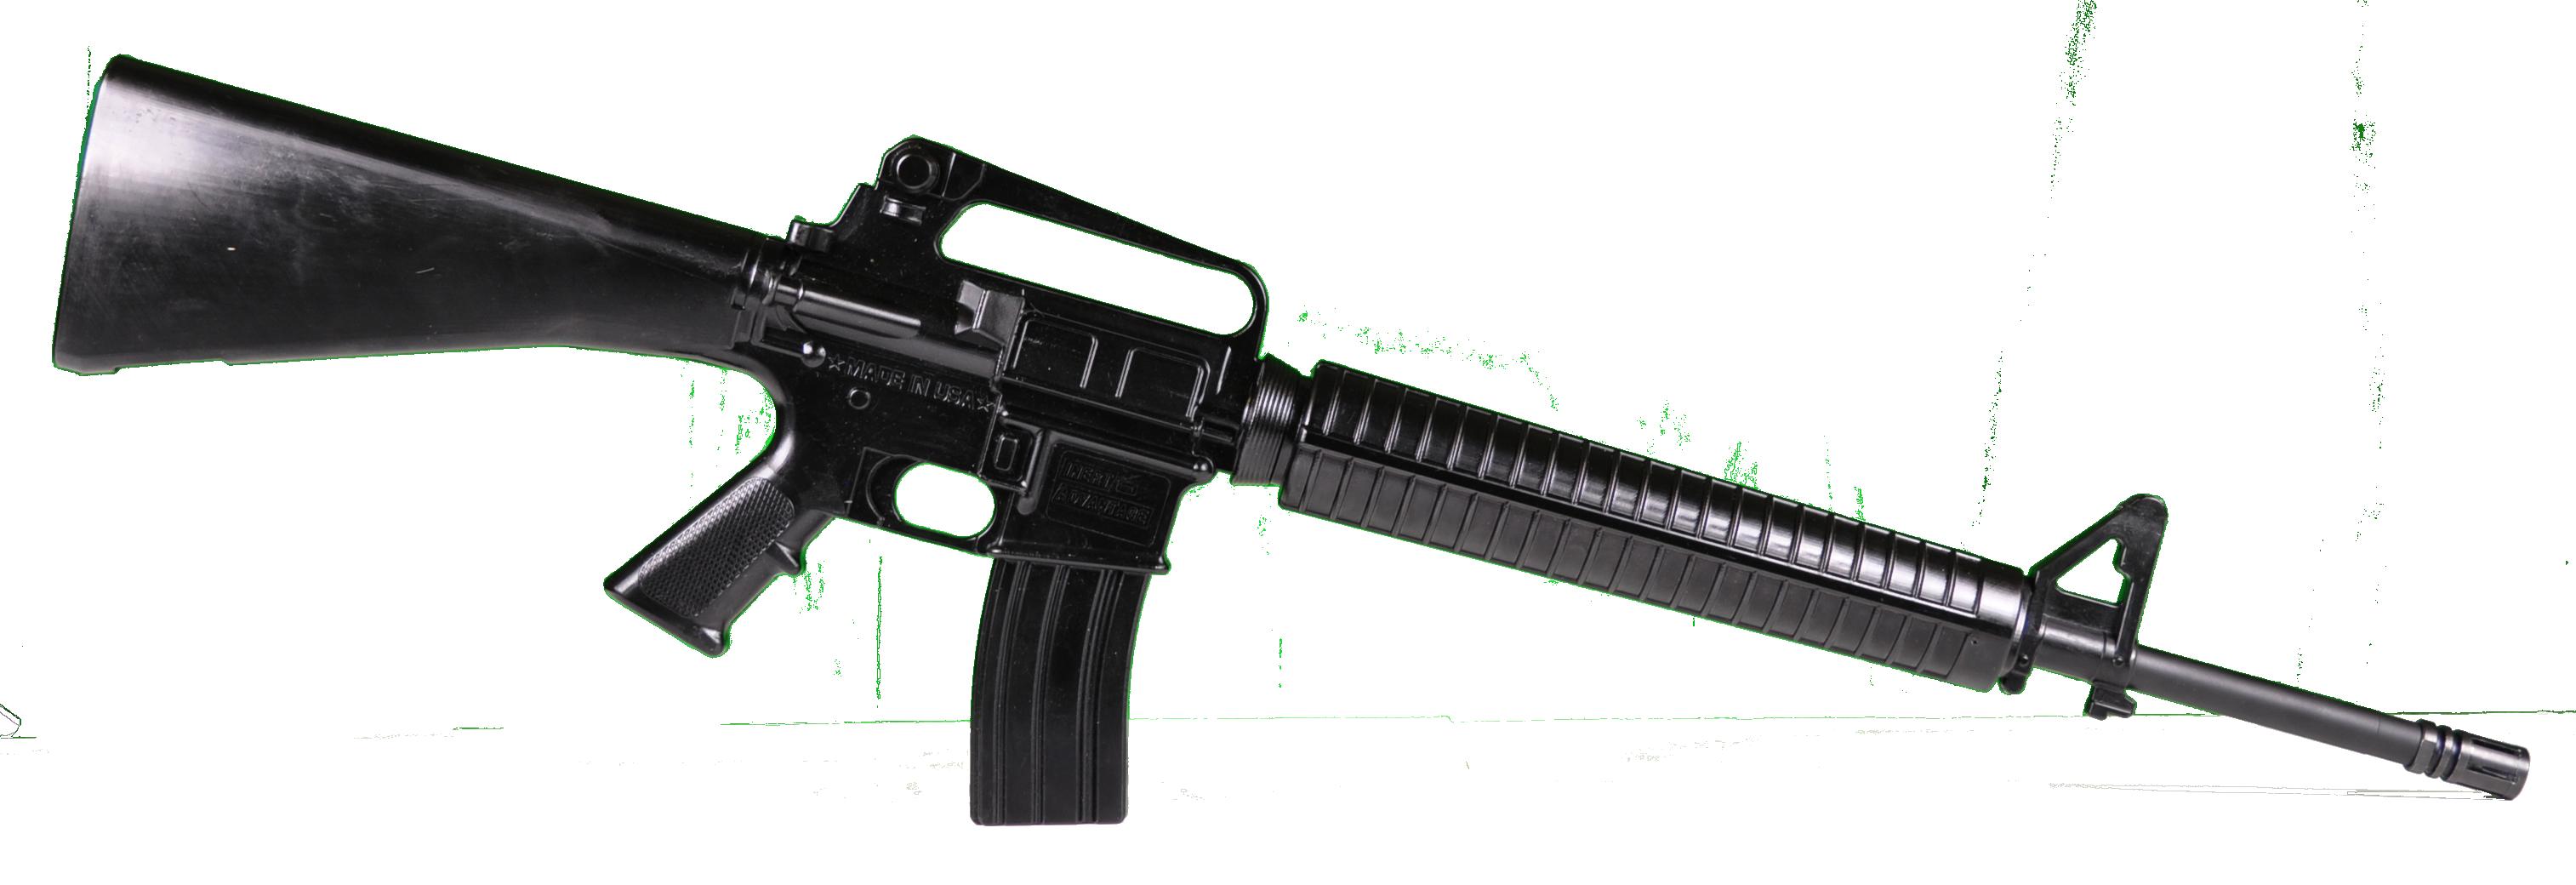 Rifle machine gun free. Fighting clipart physical assault